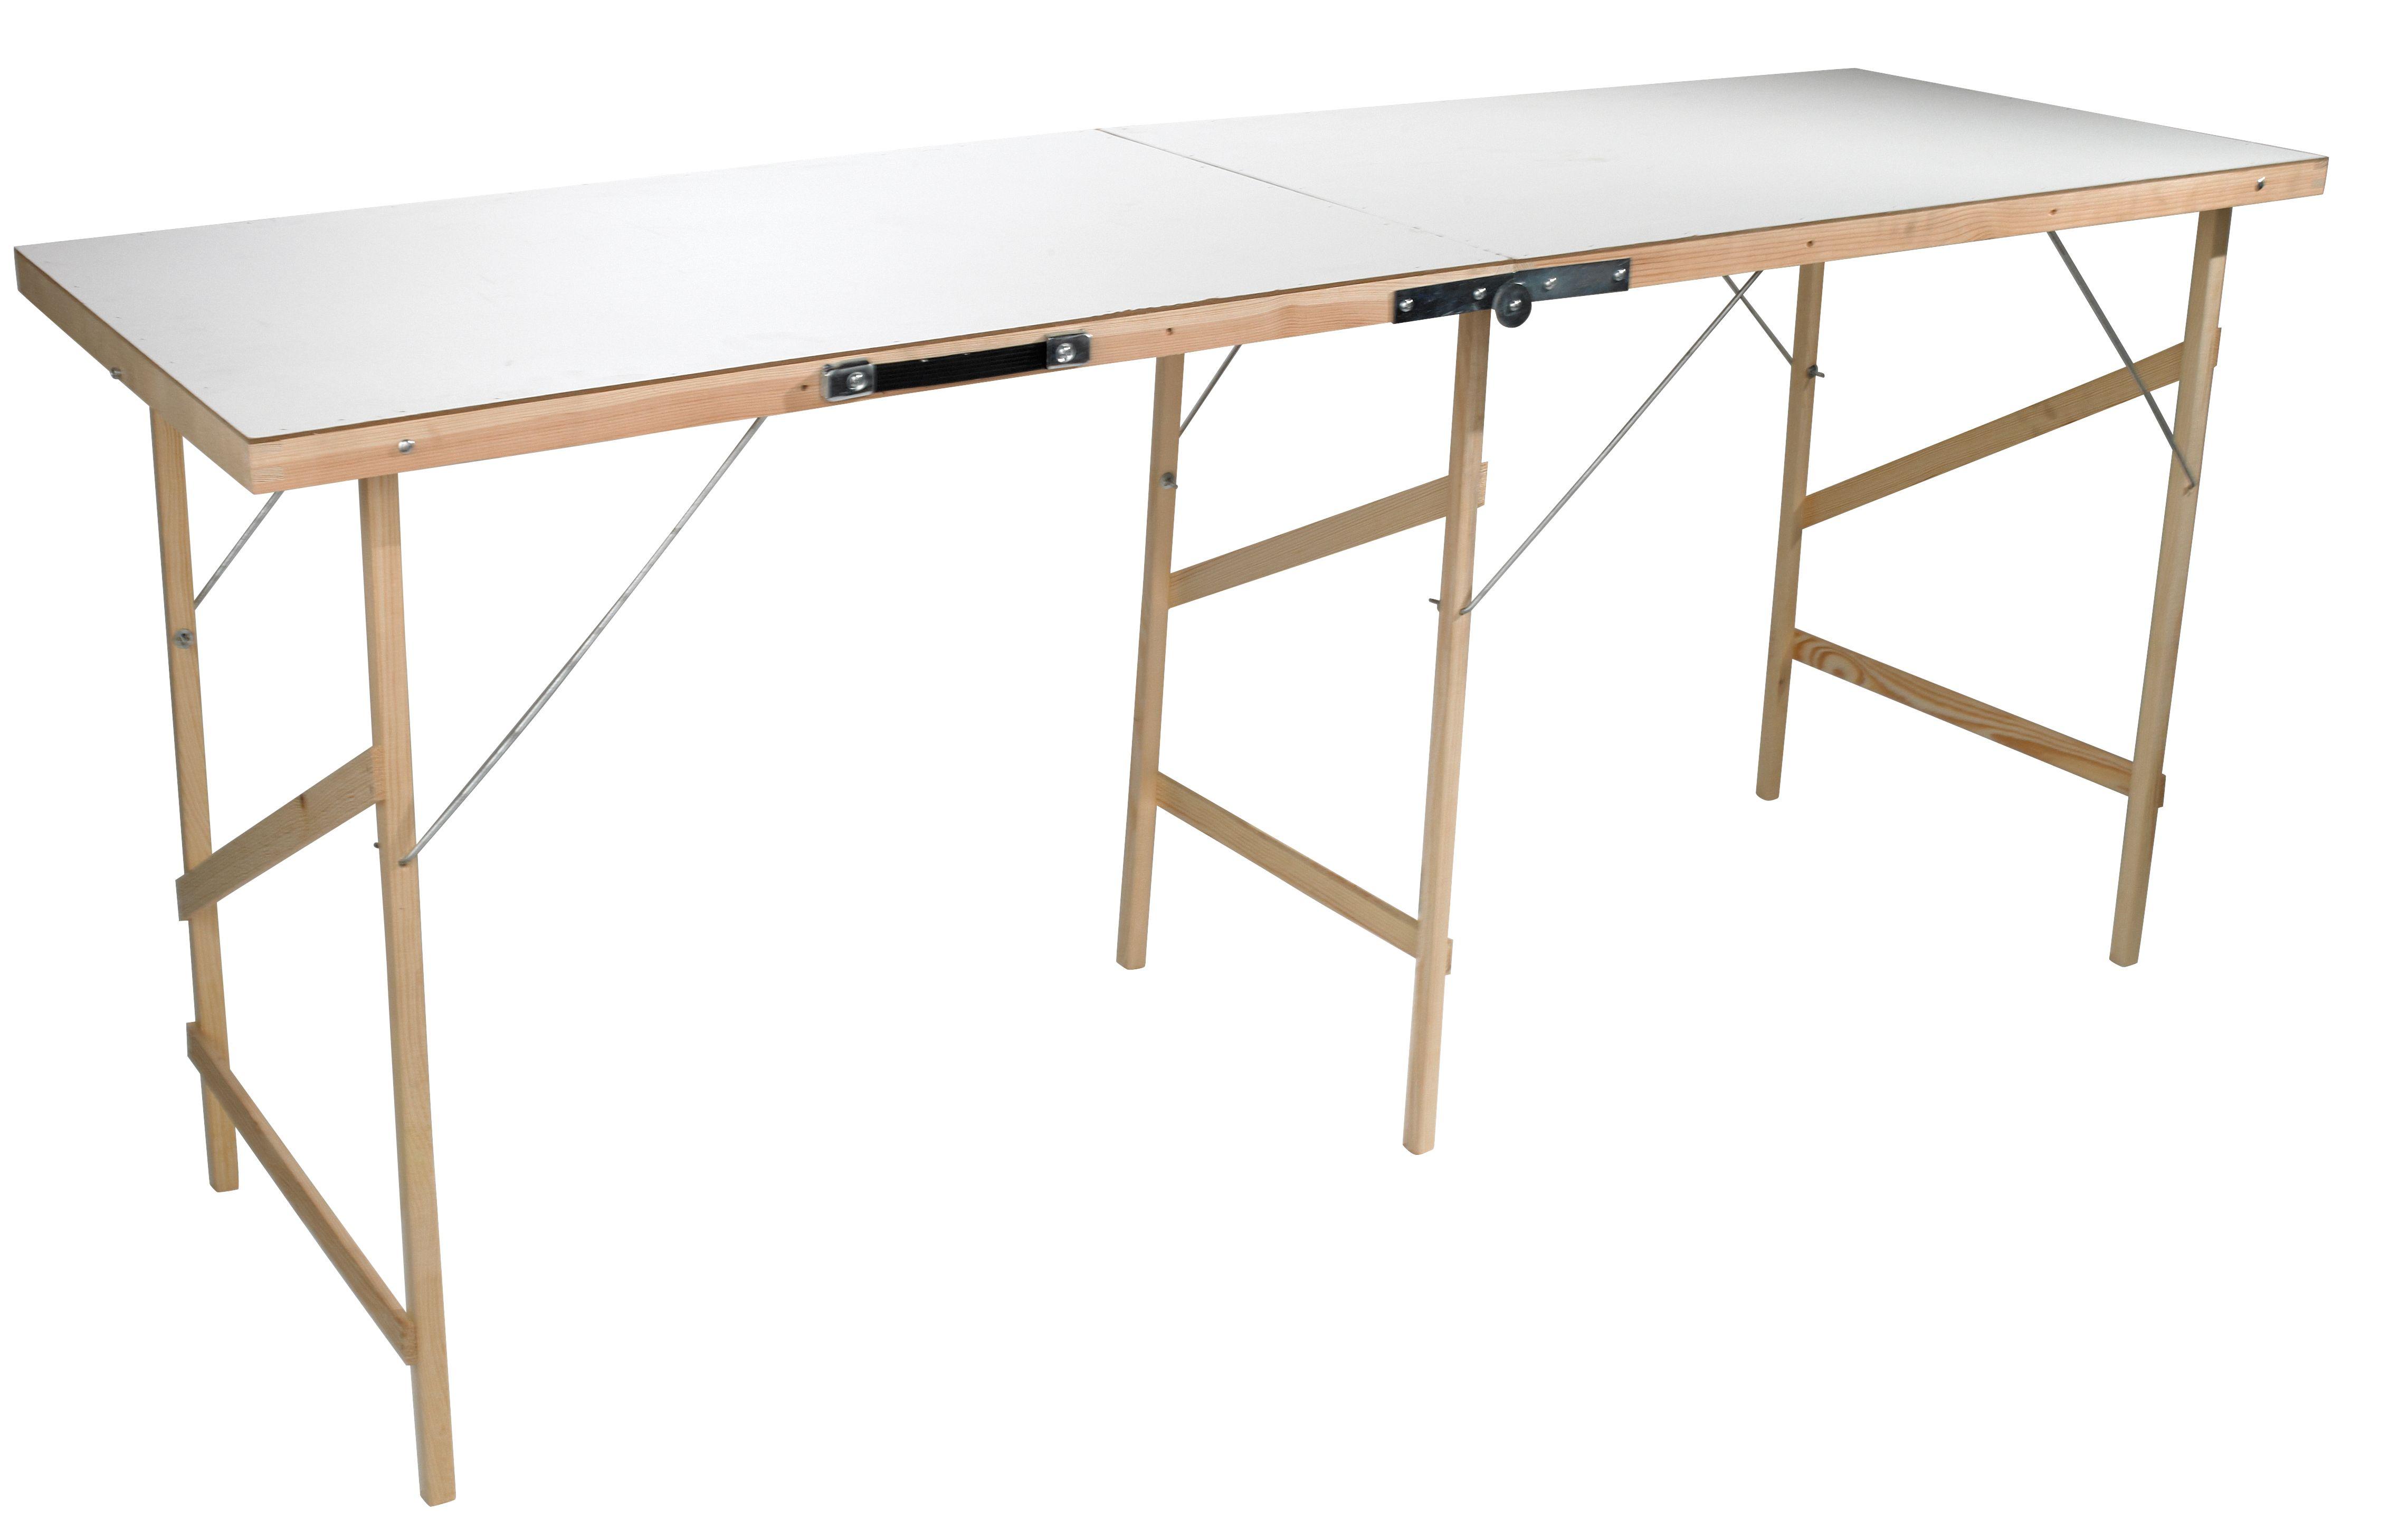 Decorators Table B&q Foldable Decorating Table H670Mm W560Mm L890Mm